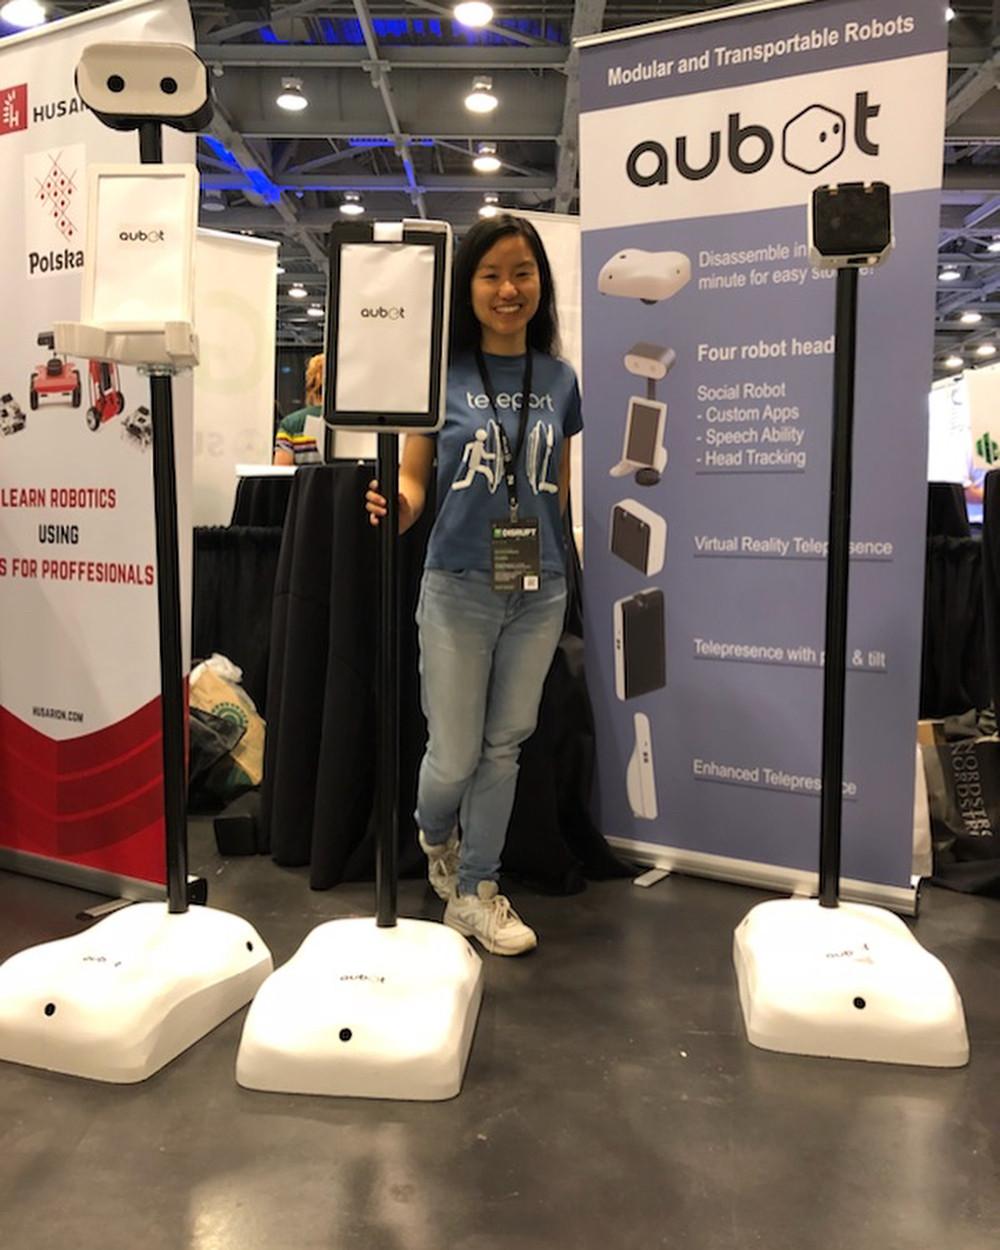 A women standing next to the aubot robot replicas at a trade show